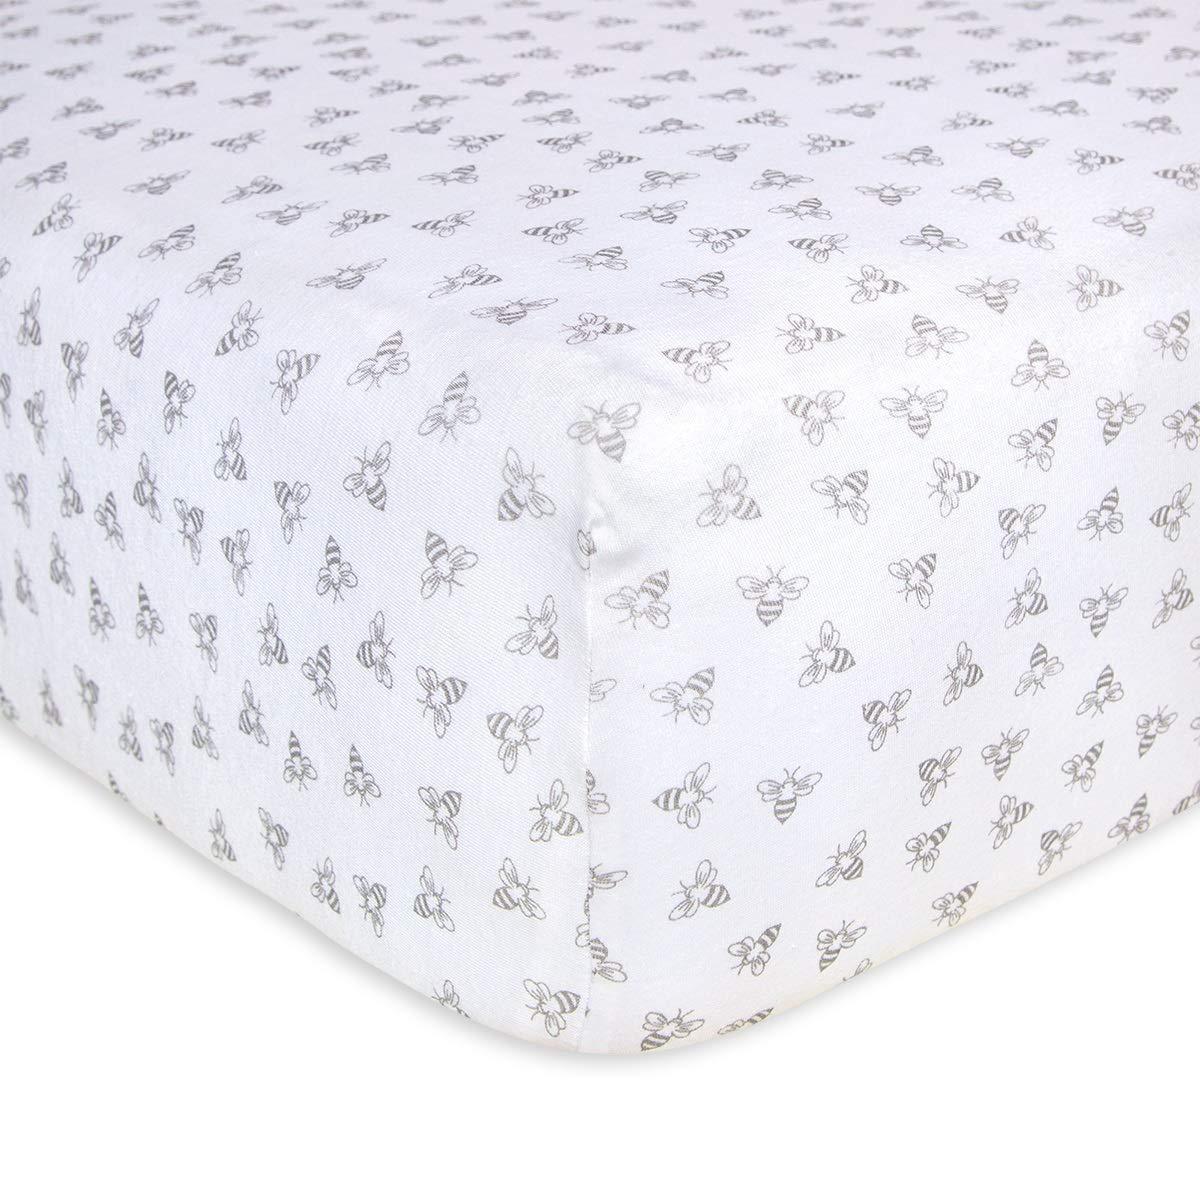 100% Organic Cotton Crib Sheet - Heather Grey Honeybee Print